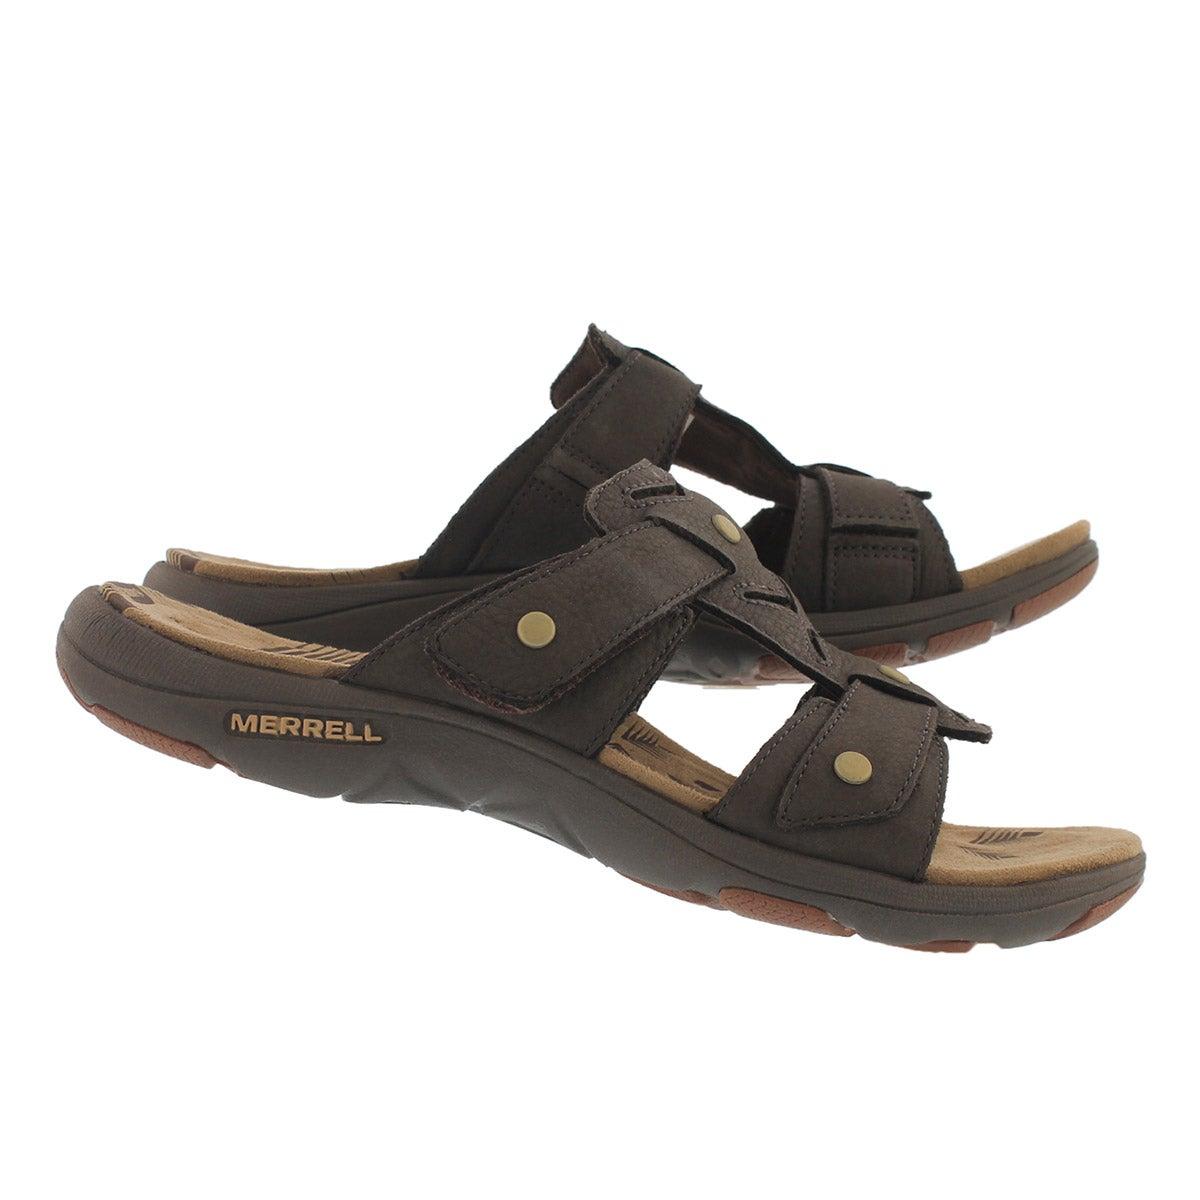 Lds Adhera Slide brn casual slide sandal